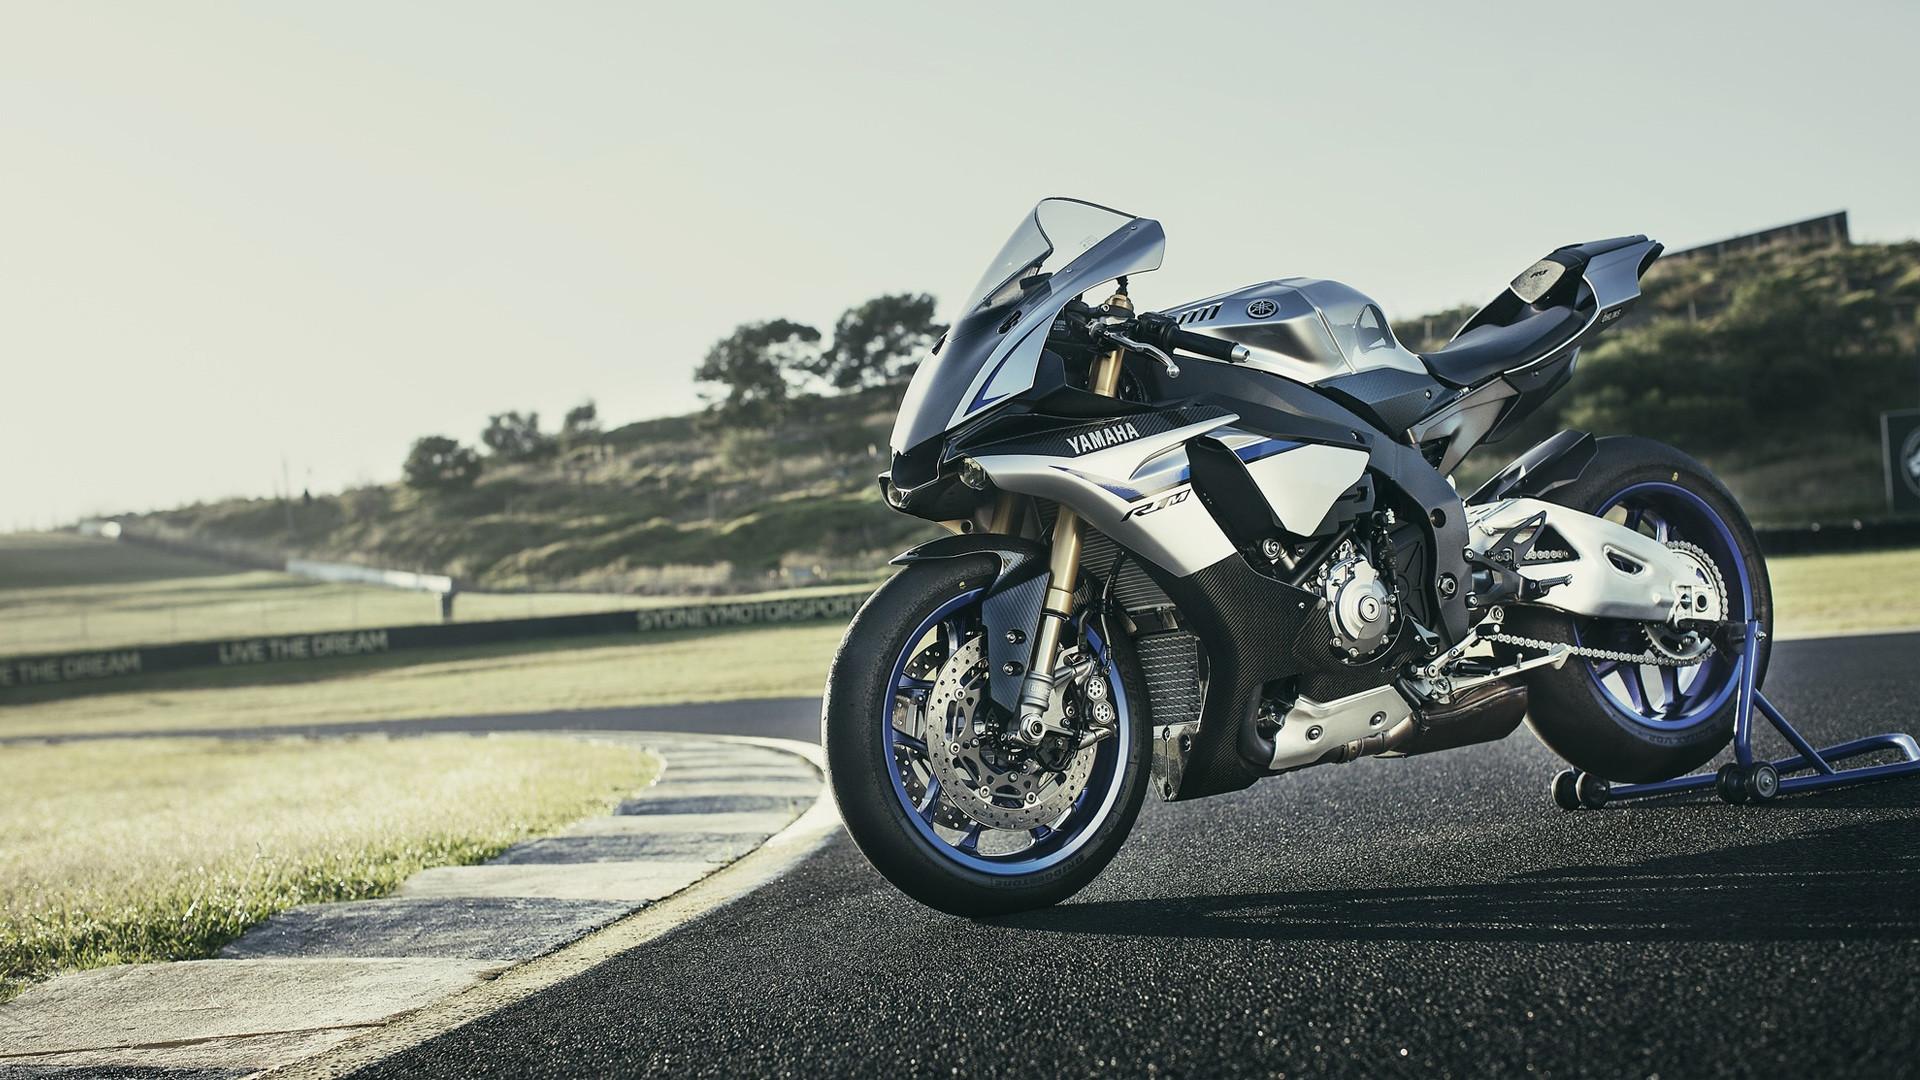 Res: 1920x1080, Yamaha YZF R1 Bike Wallpaper 62171